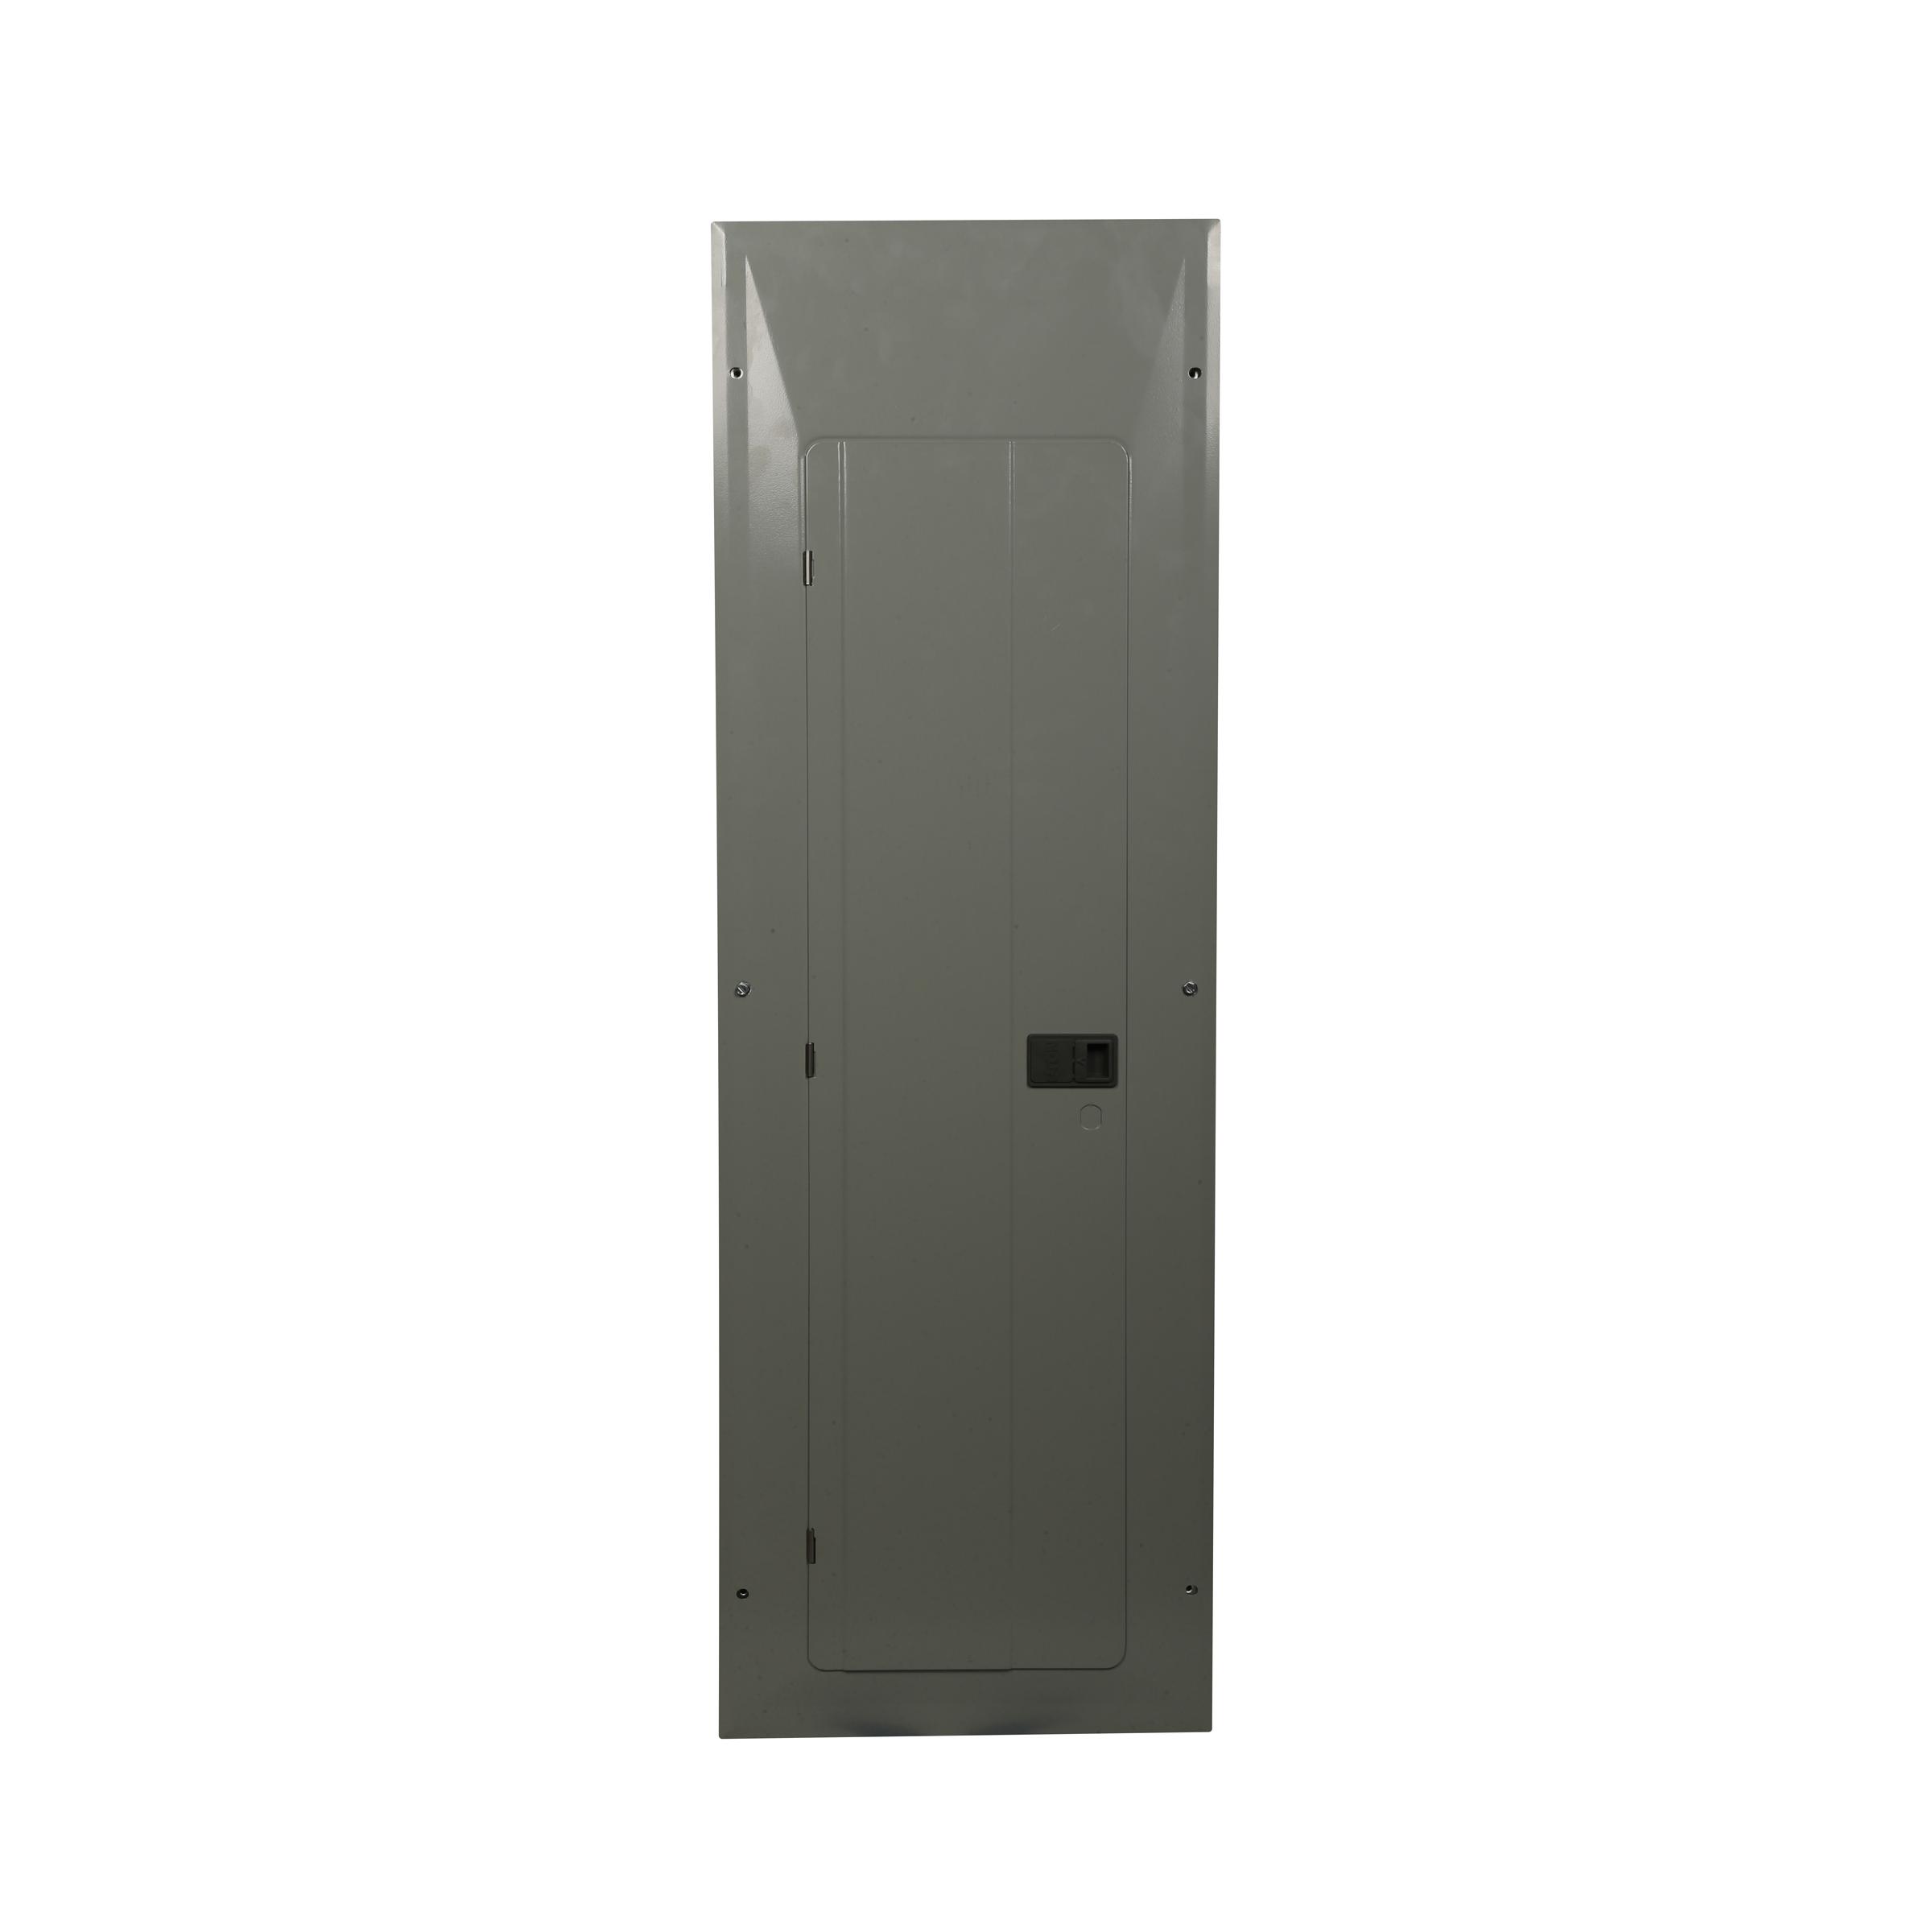 Eaton Cutler Hammer Ch12l125b Single Phase Main Lug Load: C-H 3BR4242B200